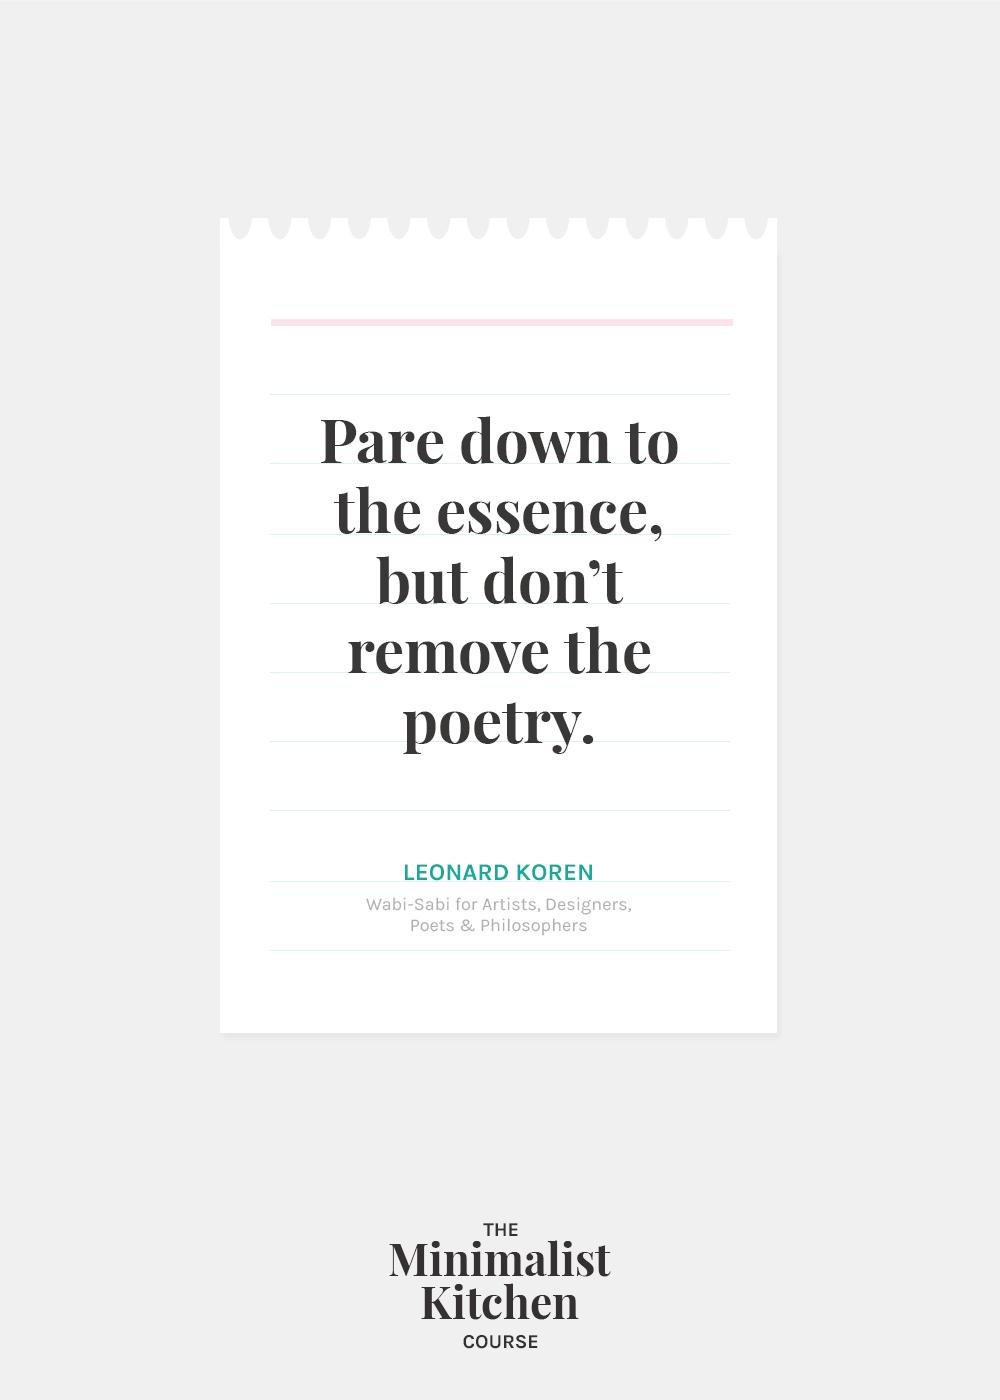 Leonard Koren paring down quote